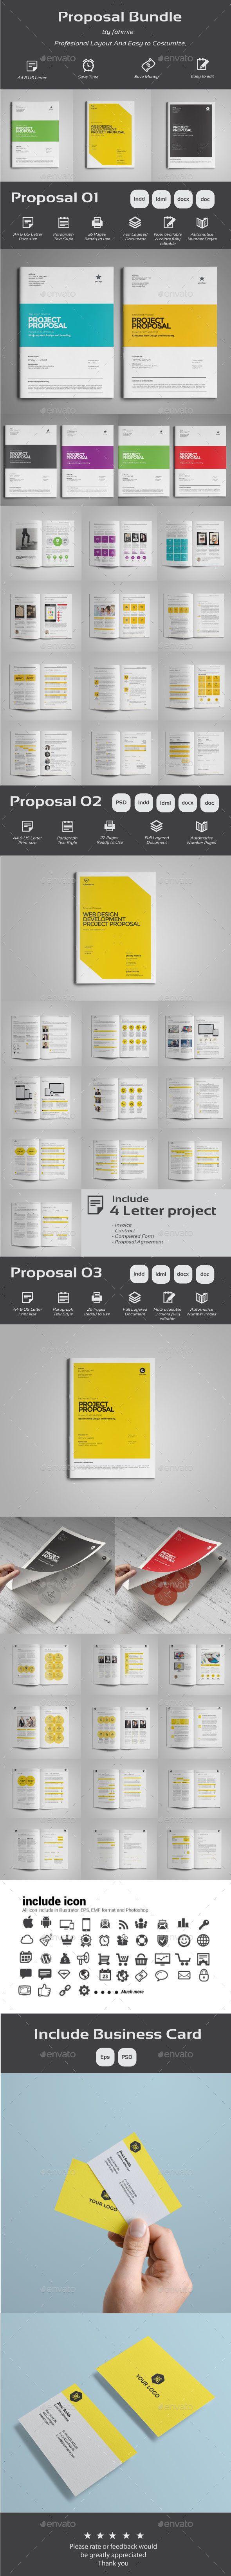 proposal report template%0A Proposal Bundle